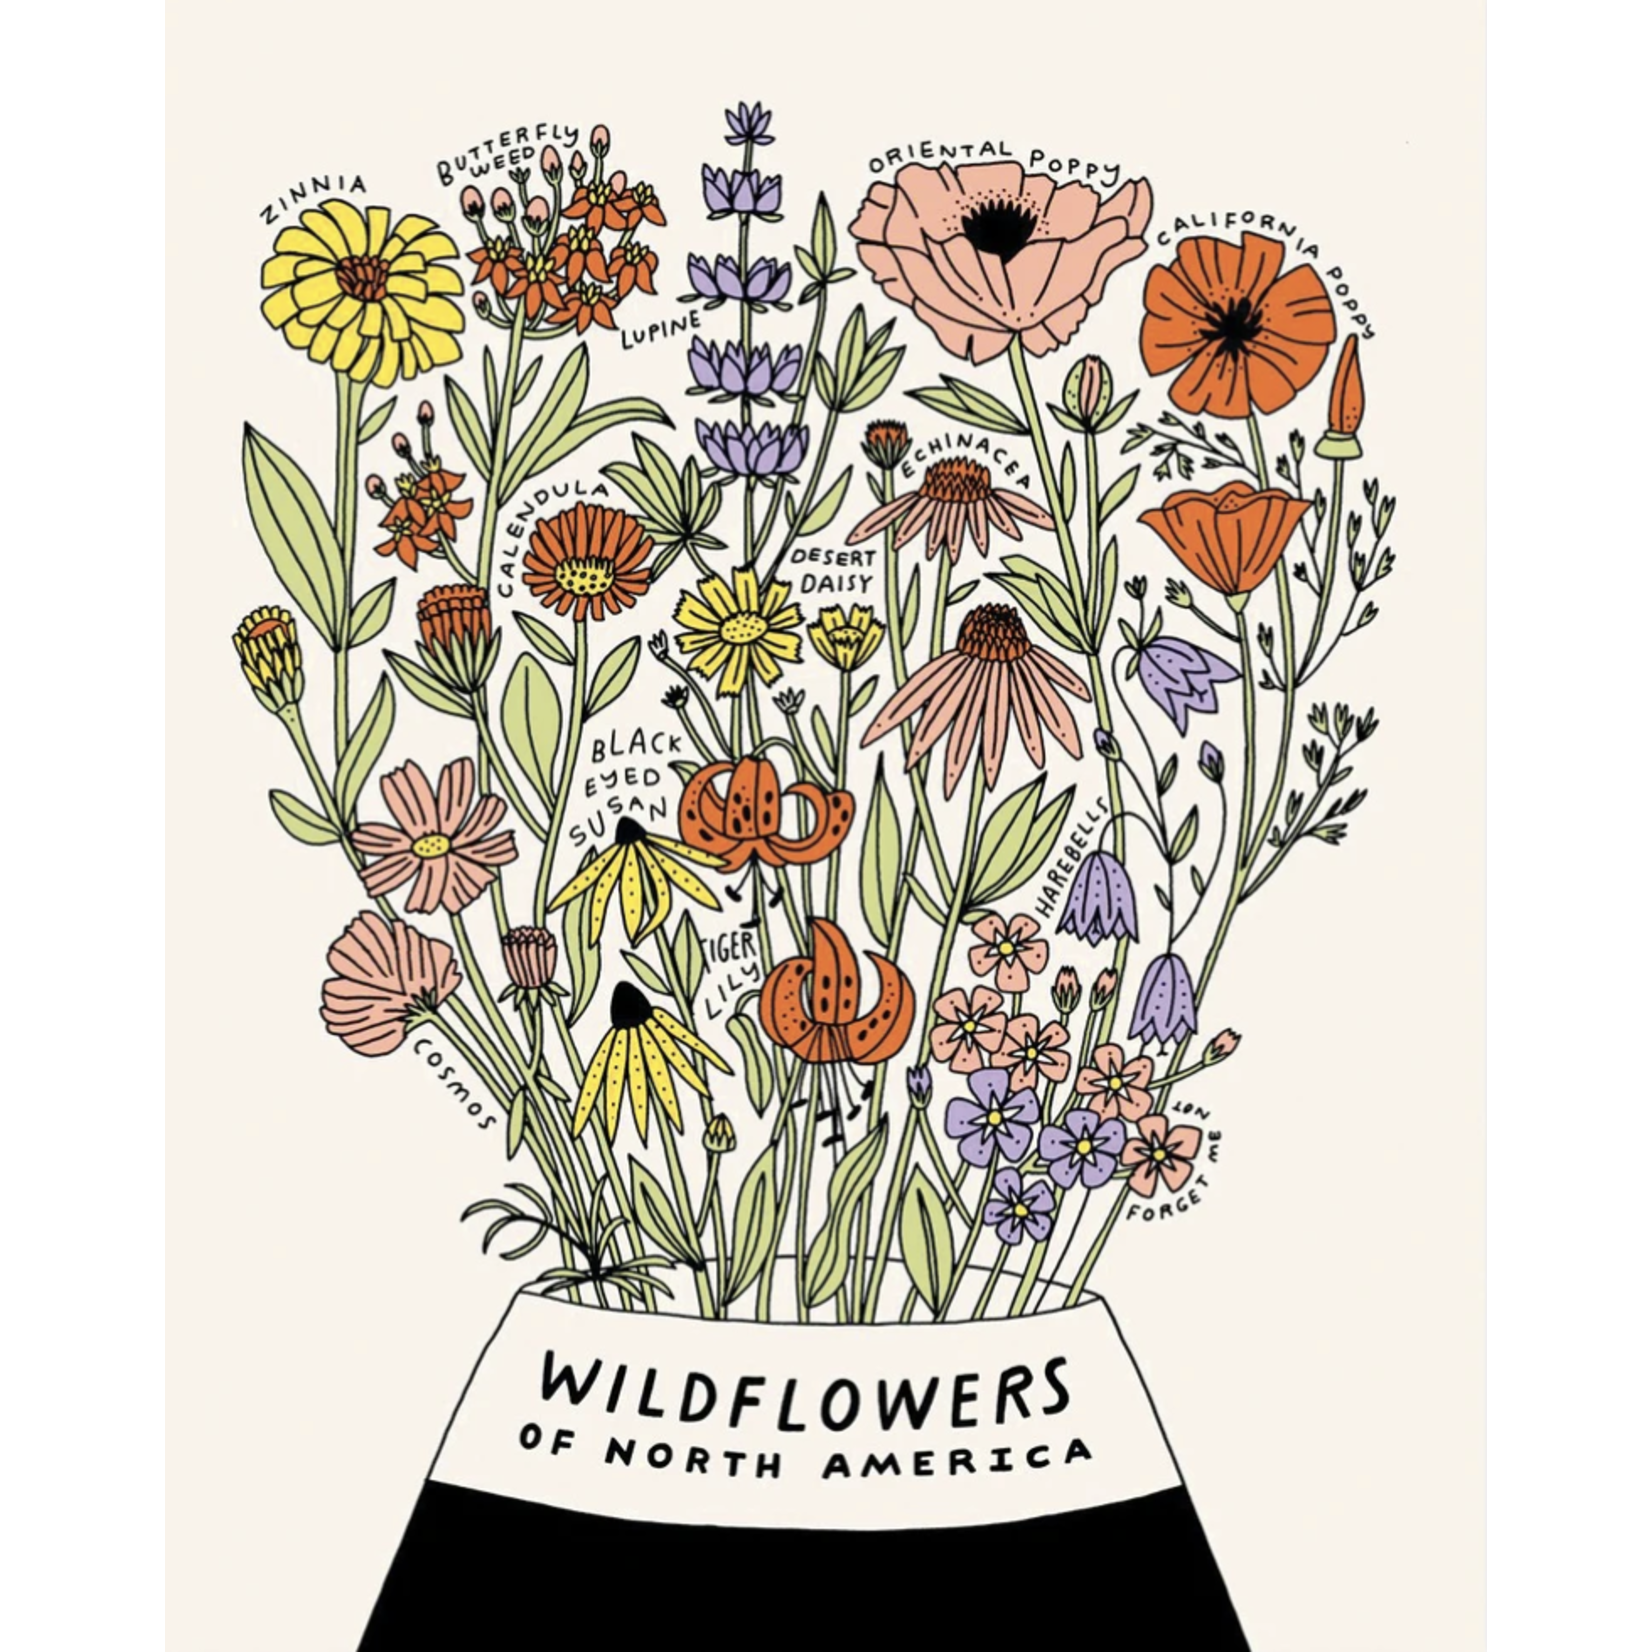 Worthwhile Paper Wildflowers Of North America 11x14 Art Print